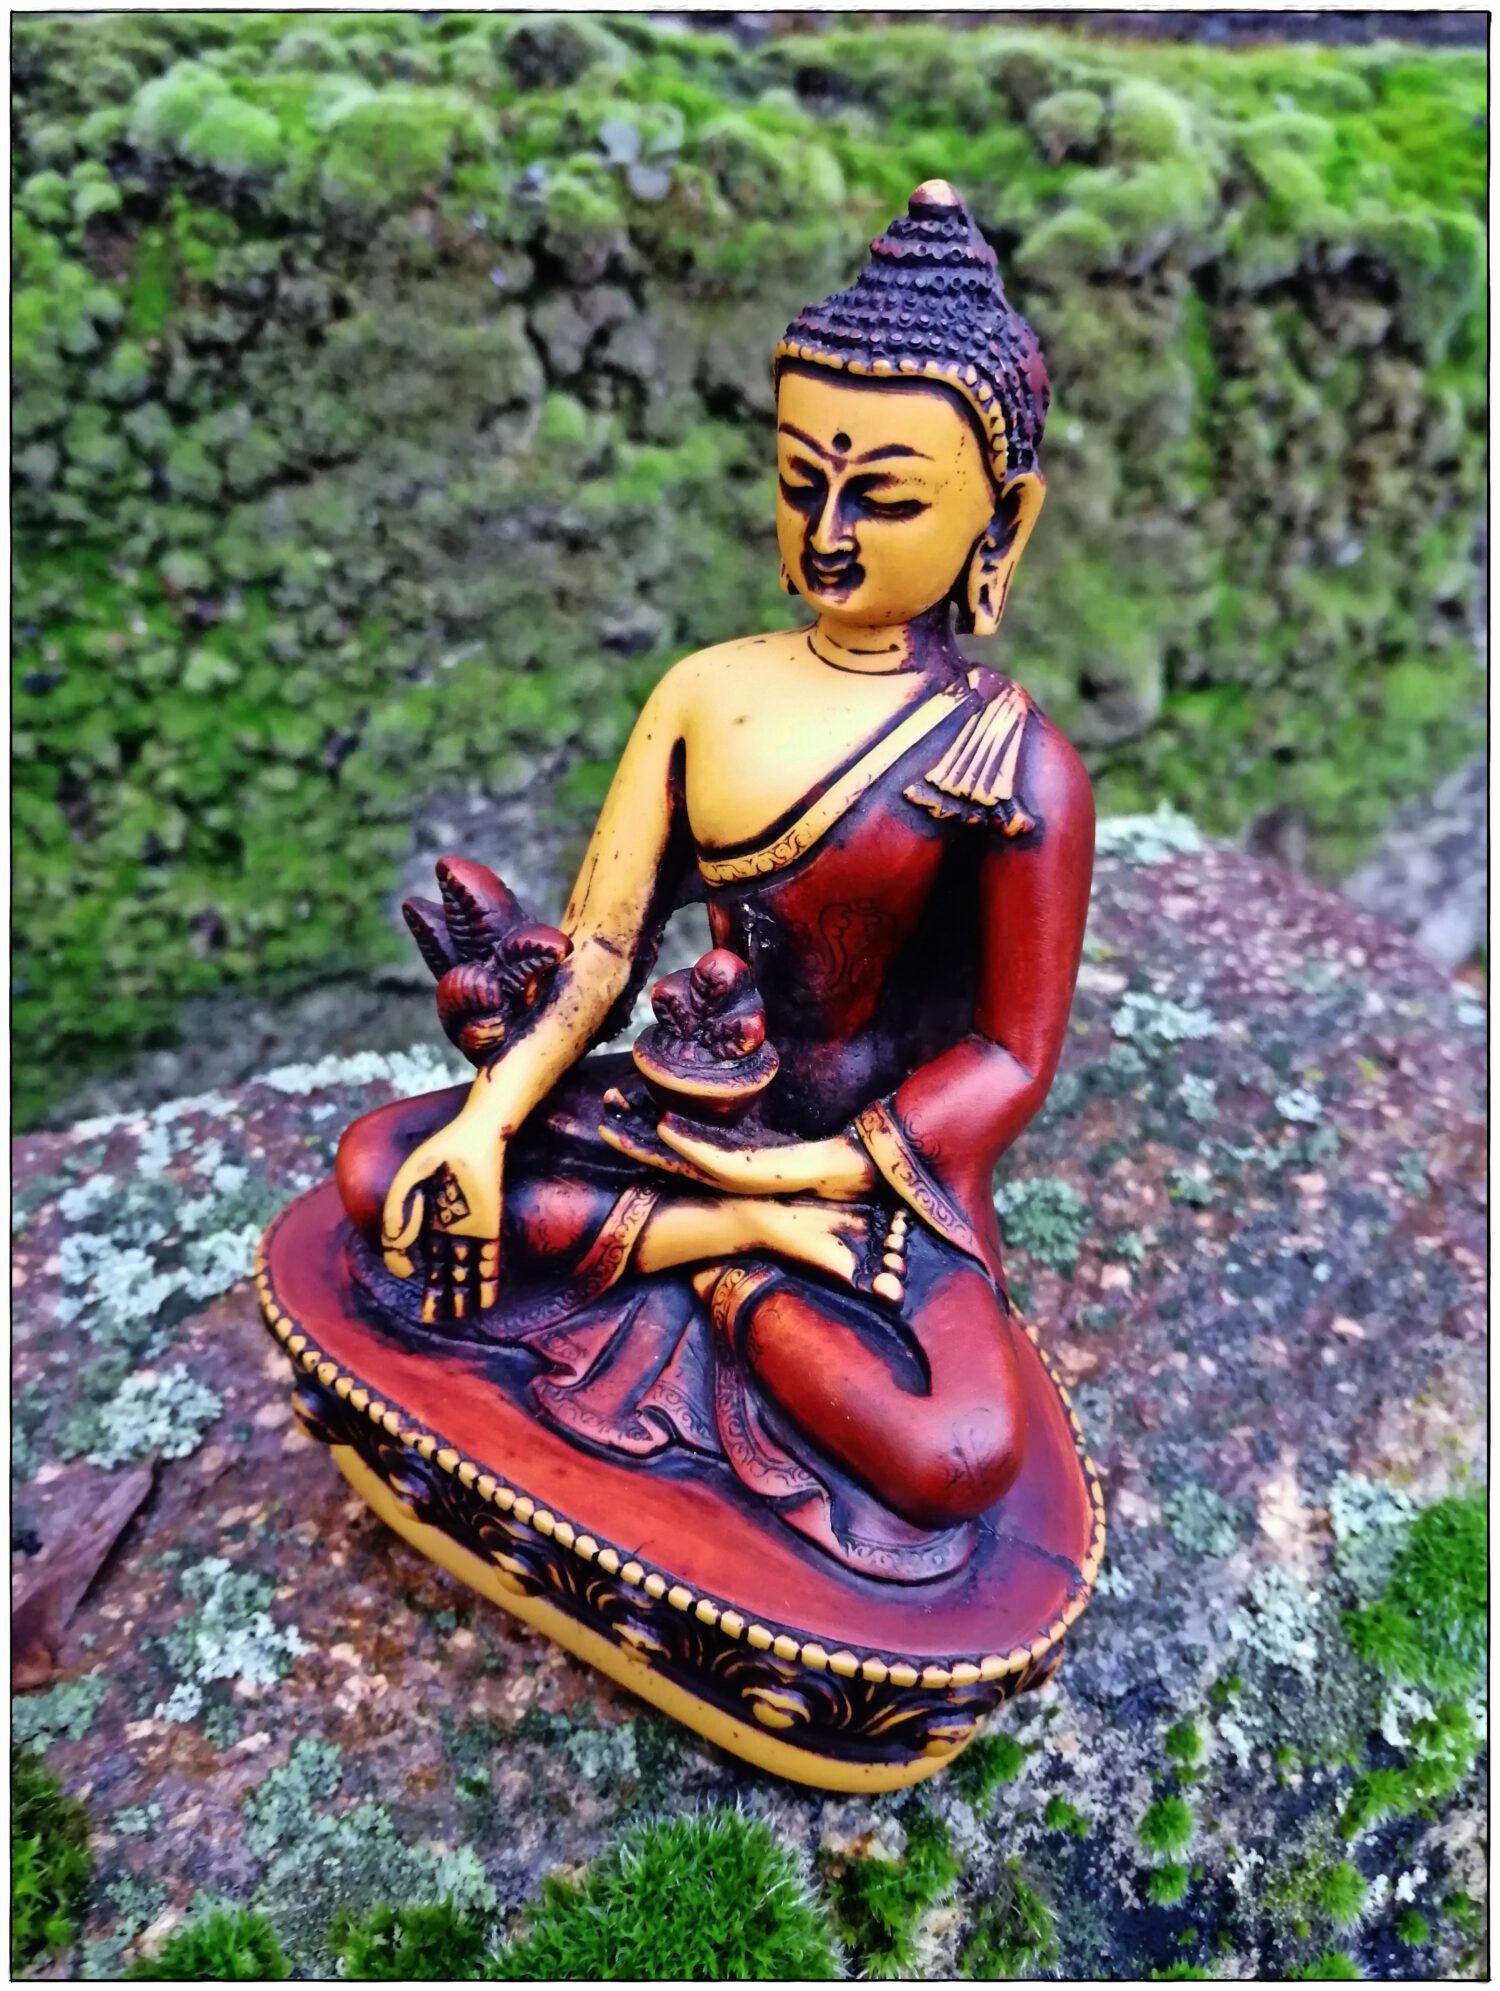 Medizin Buddha Statue antiker Stil